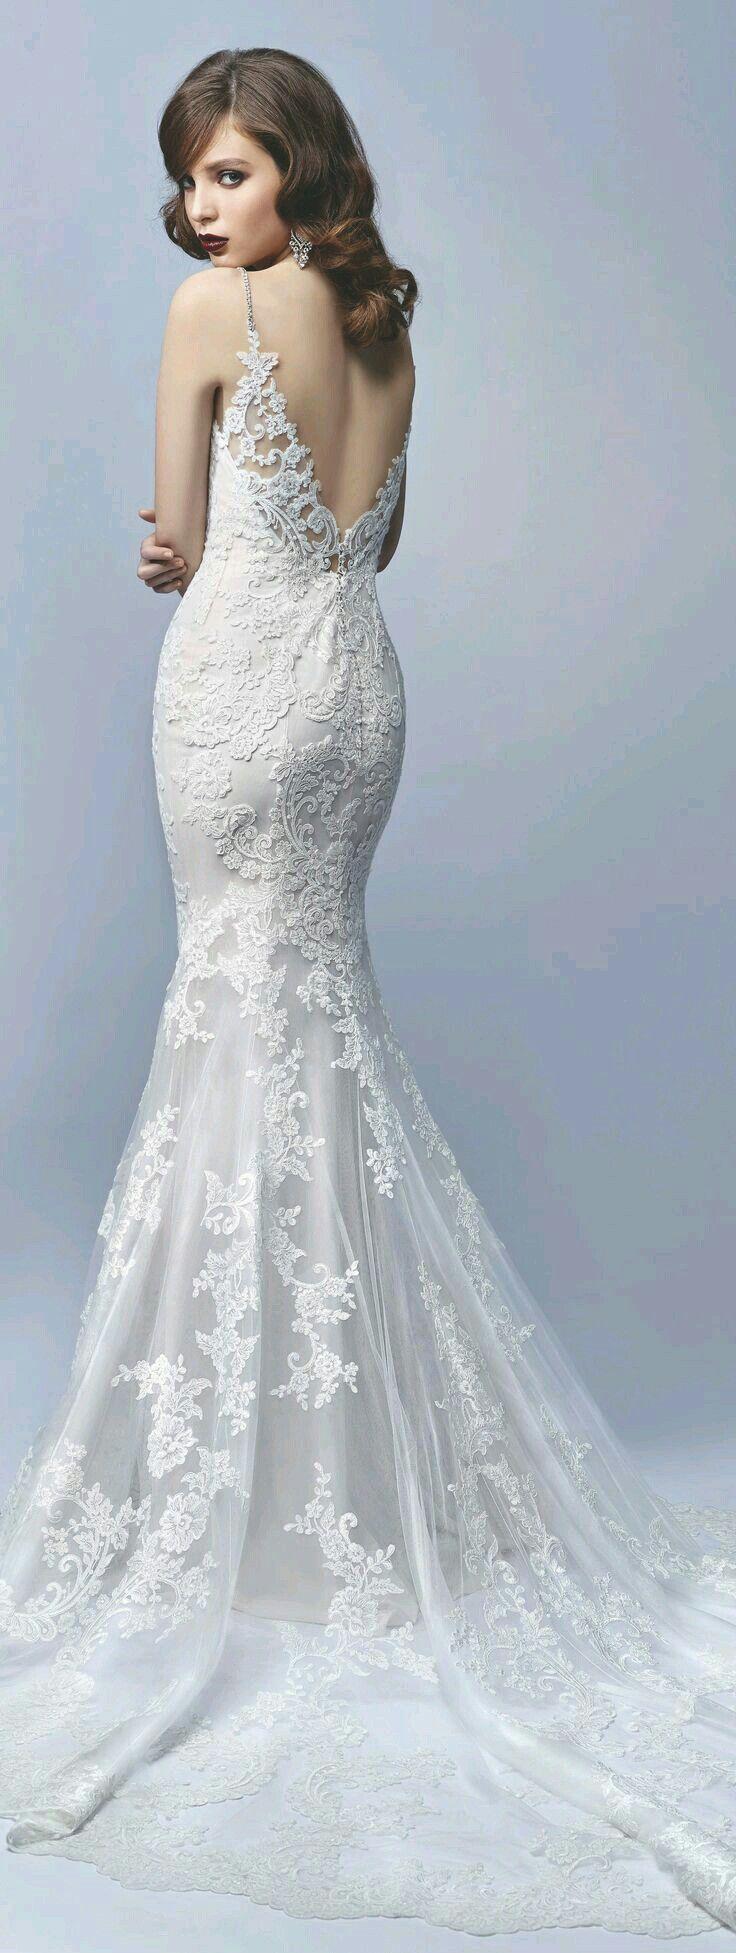 29 best hotpink.wedding images on Pinterest | Homecoming dresses ...